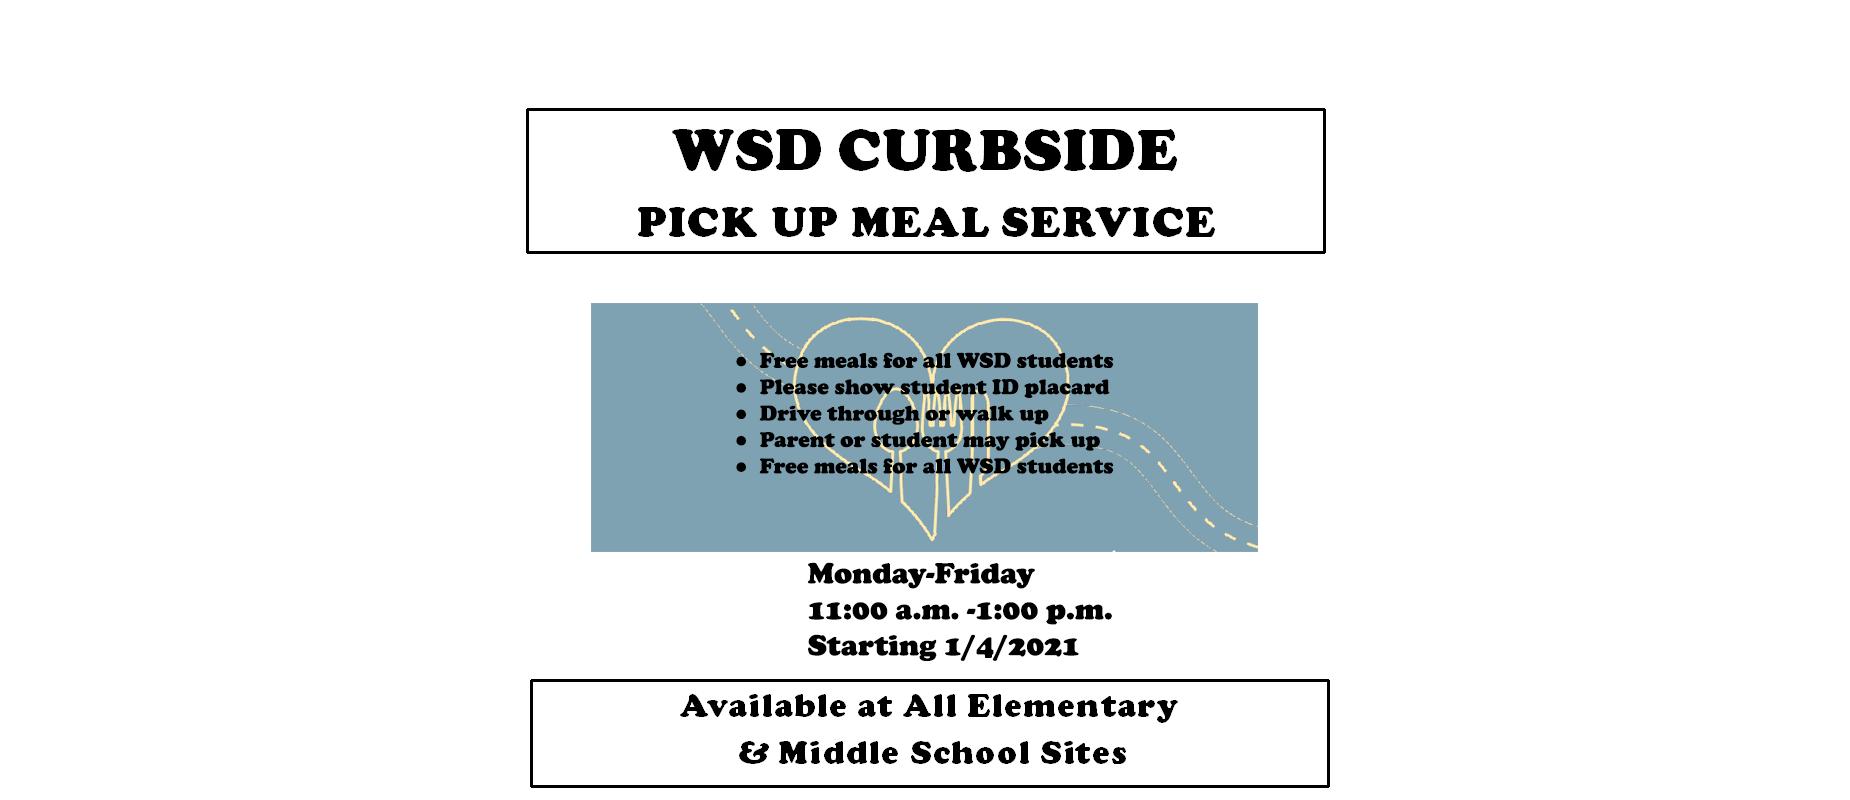 WSD Curbside Meal Pickup Service